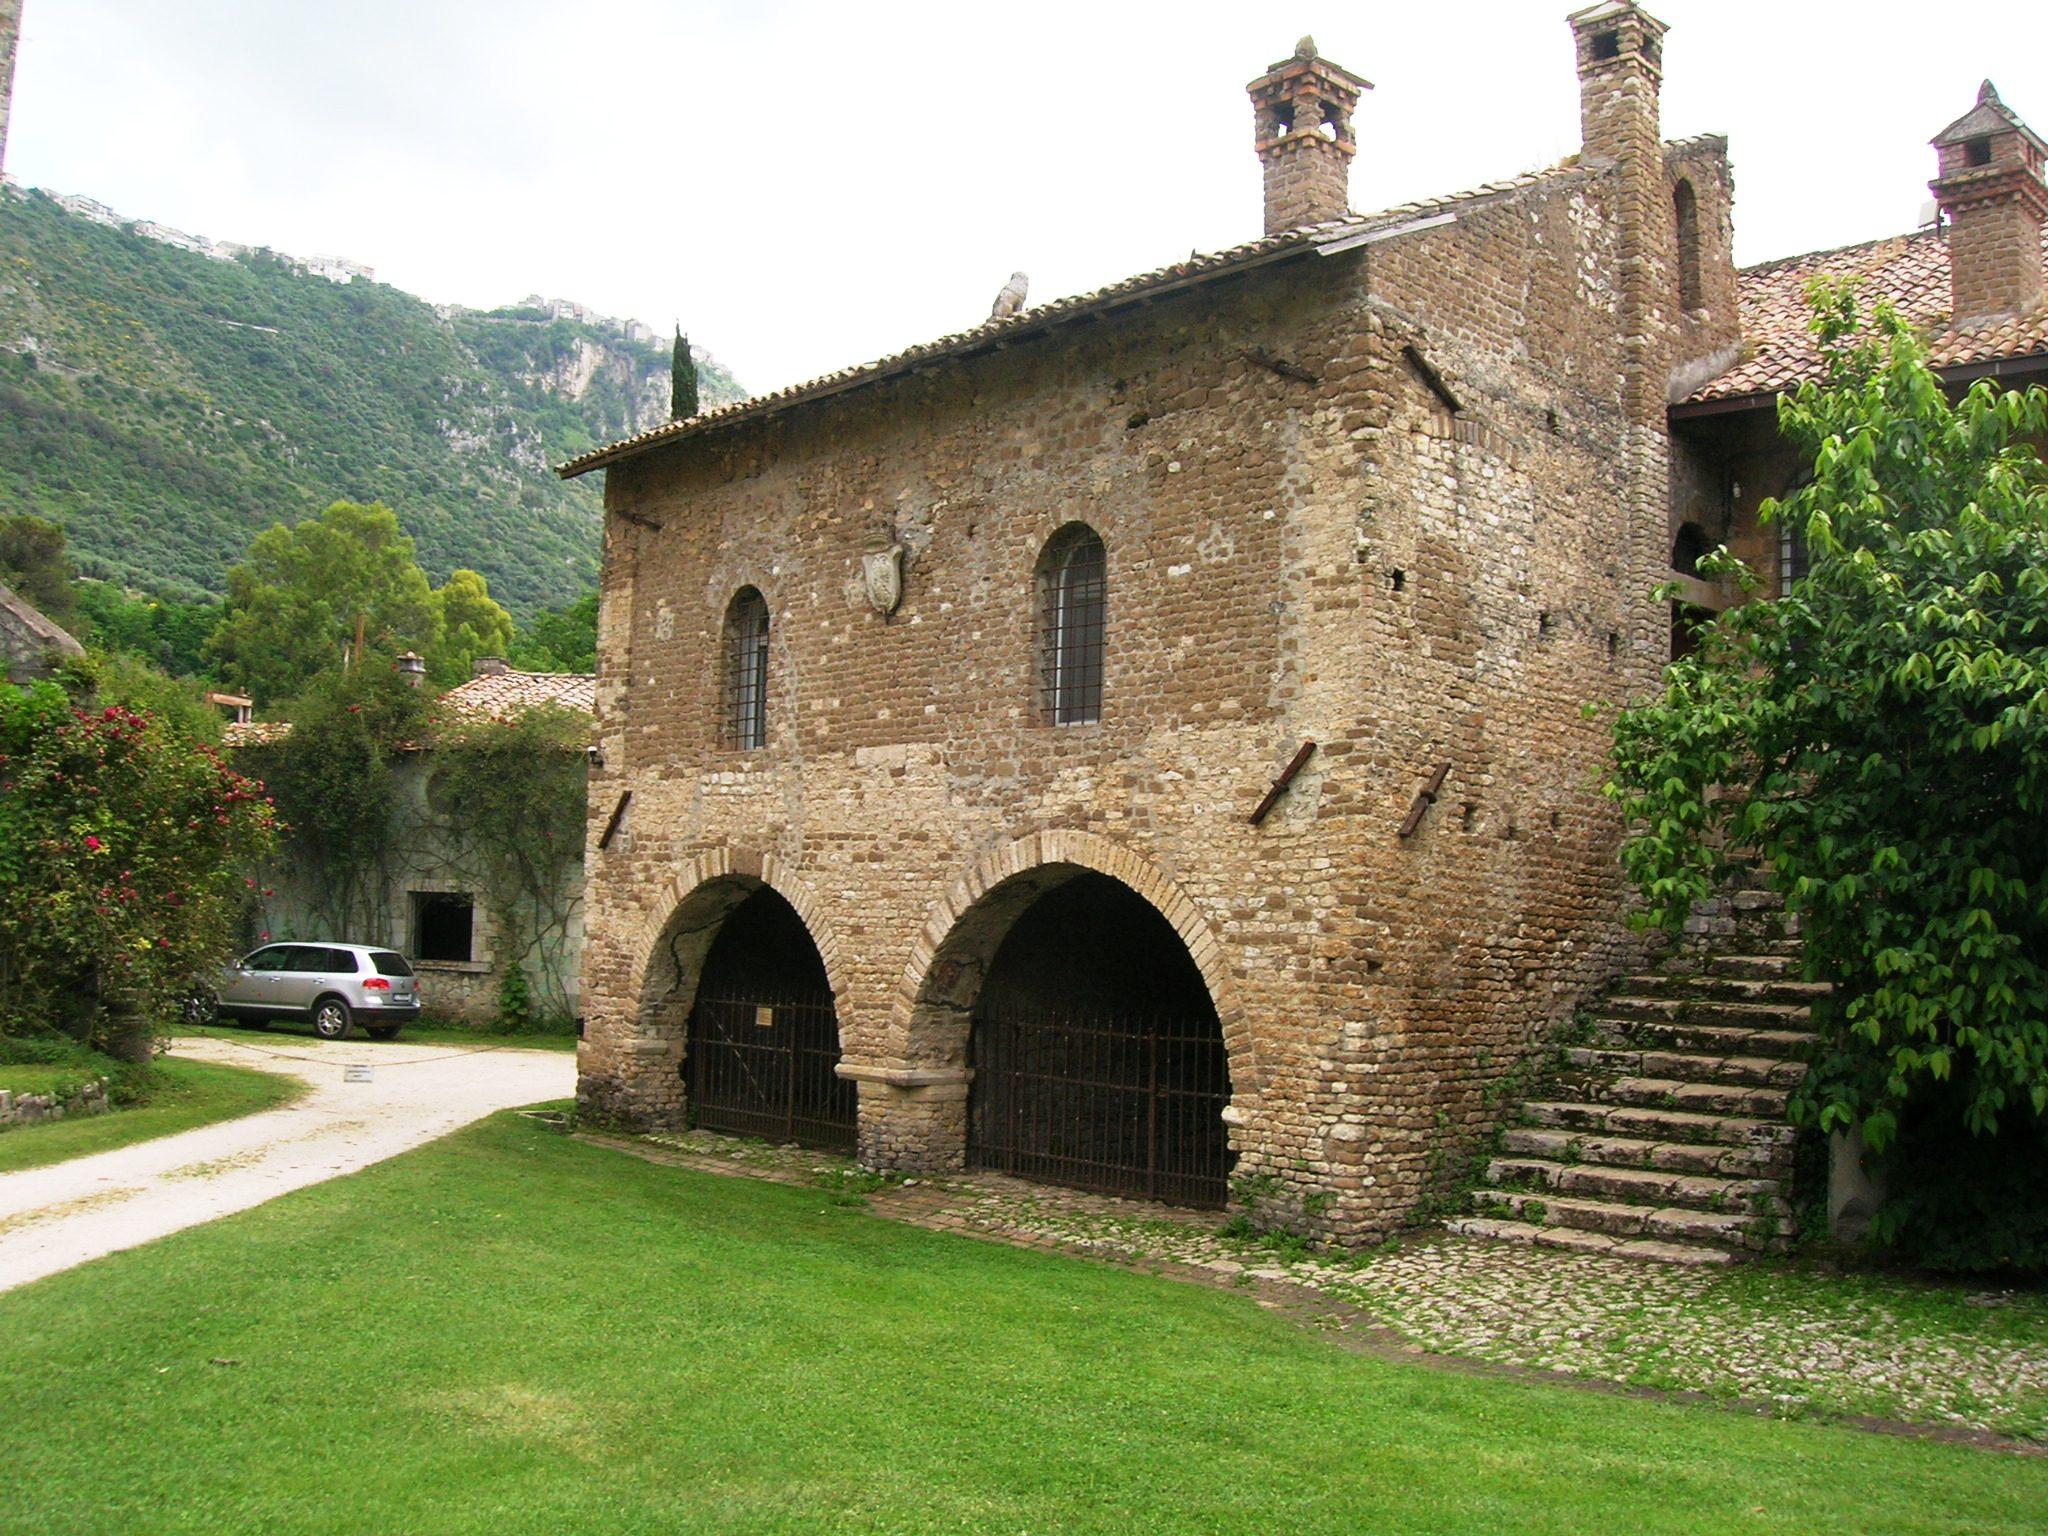 Historie medievali il giardino di ninfa - Il giardino di ninfa ...